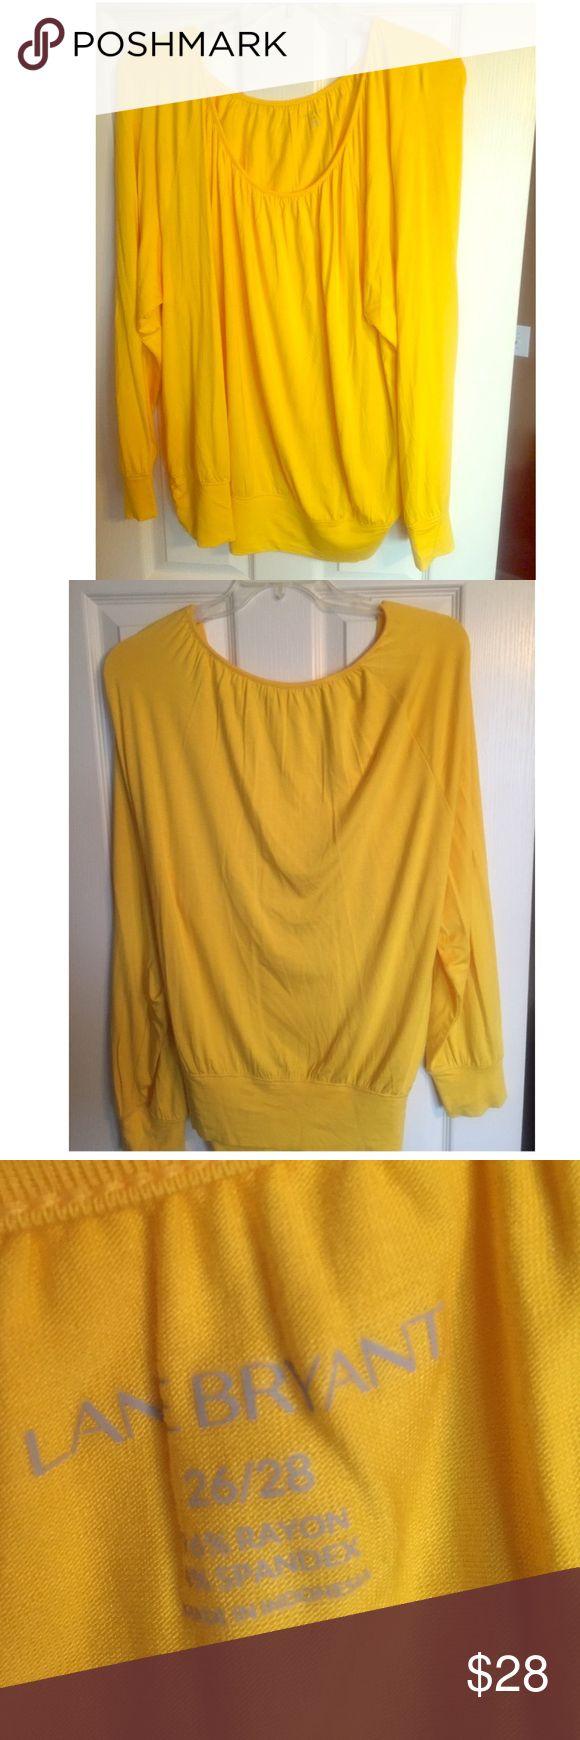 Lane Bryant yellow long sleeved top Never worn Lane Bryant yellow long sleeved top Never worn Size 26/28 Lane Bryant Tops Blouses